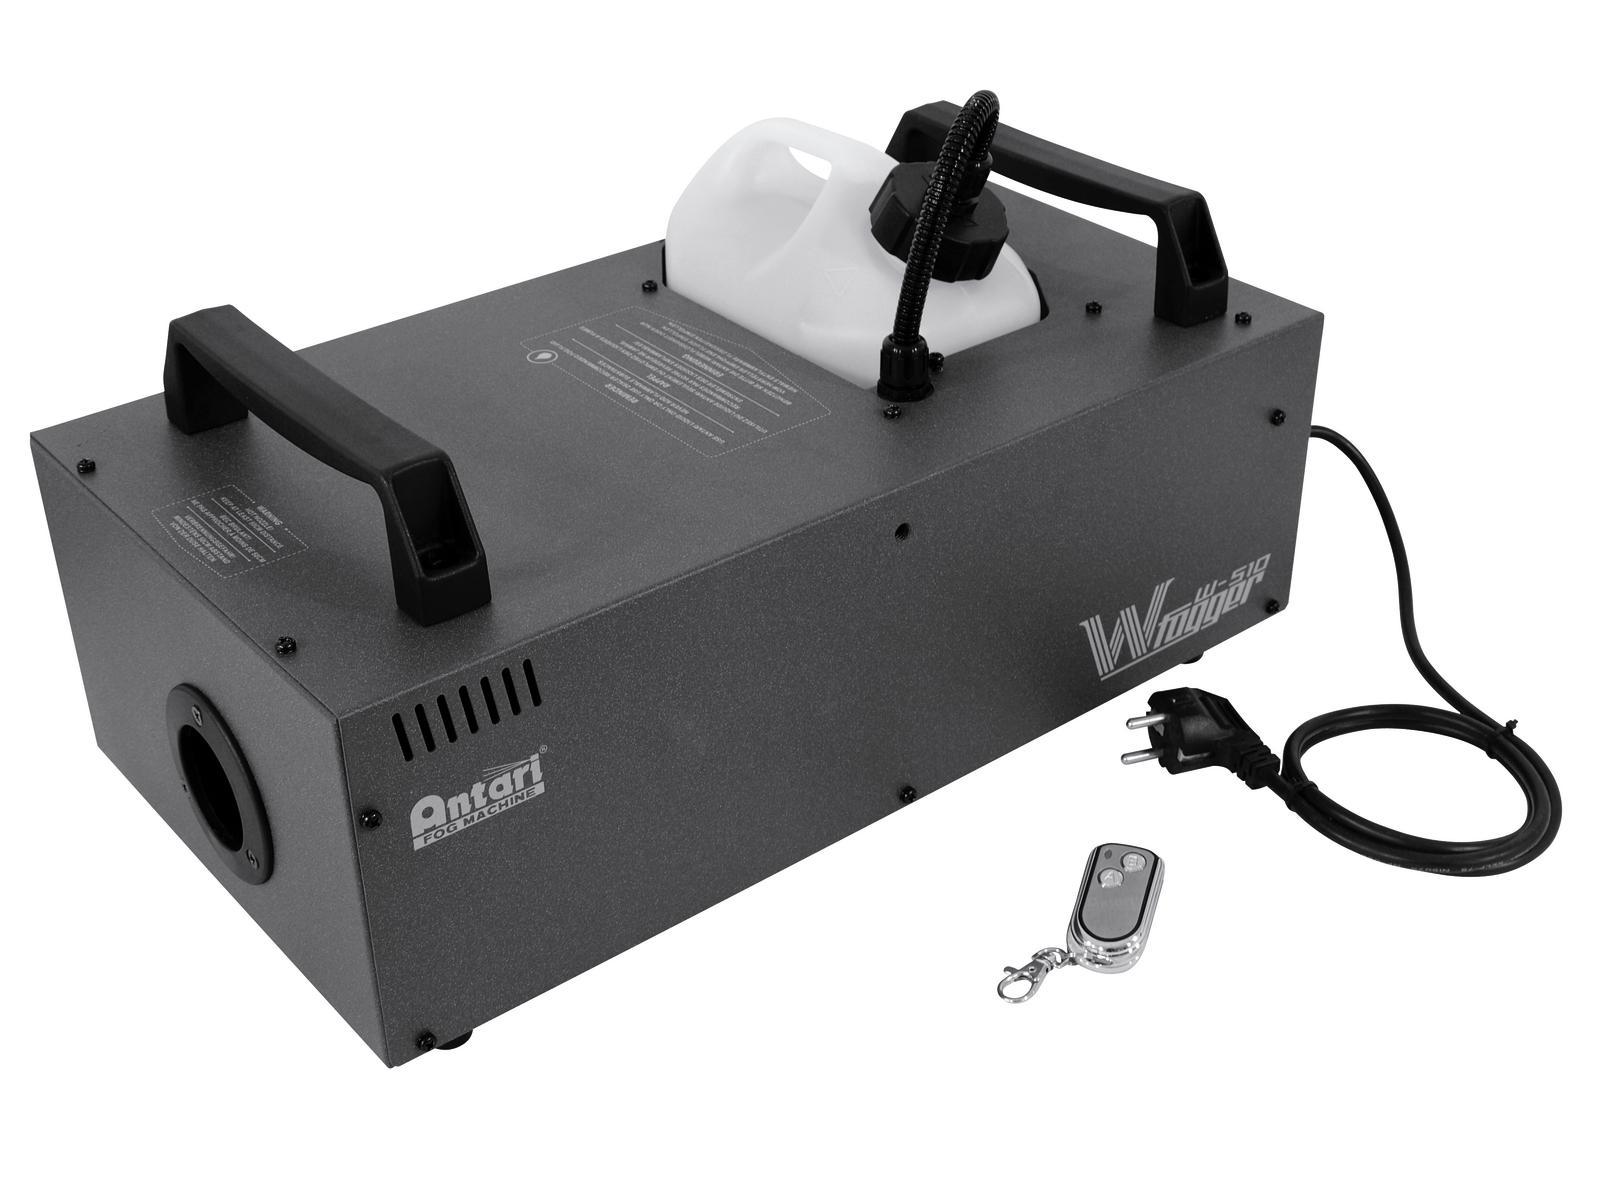 Macchina del fumo senza fili, 1000 W,dmx, contoller, per dj e club ANTARI W-510